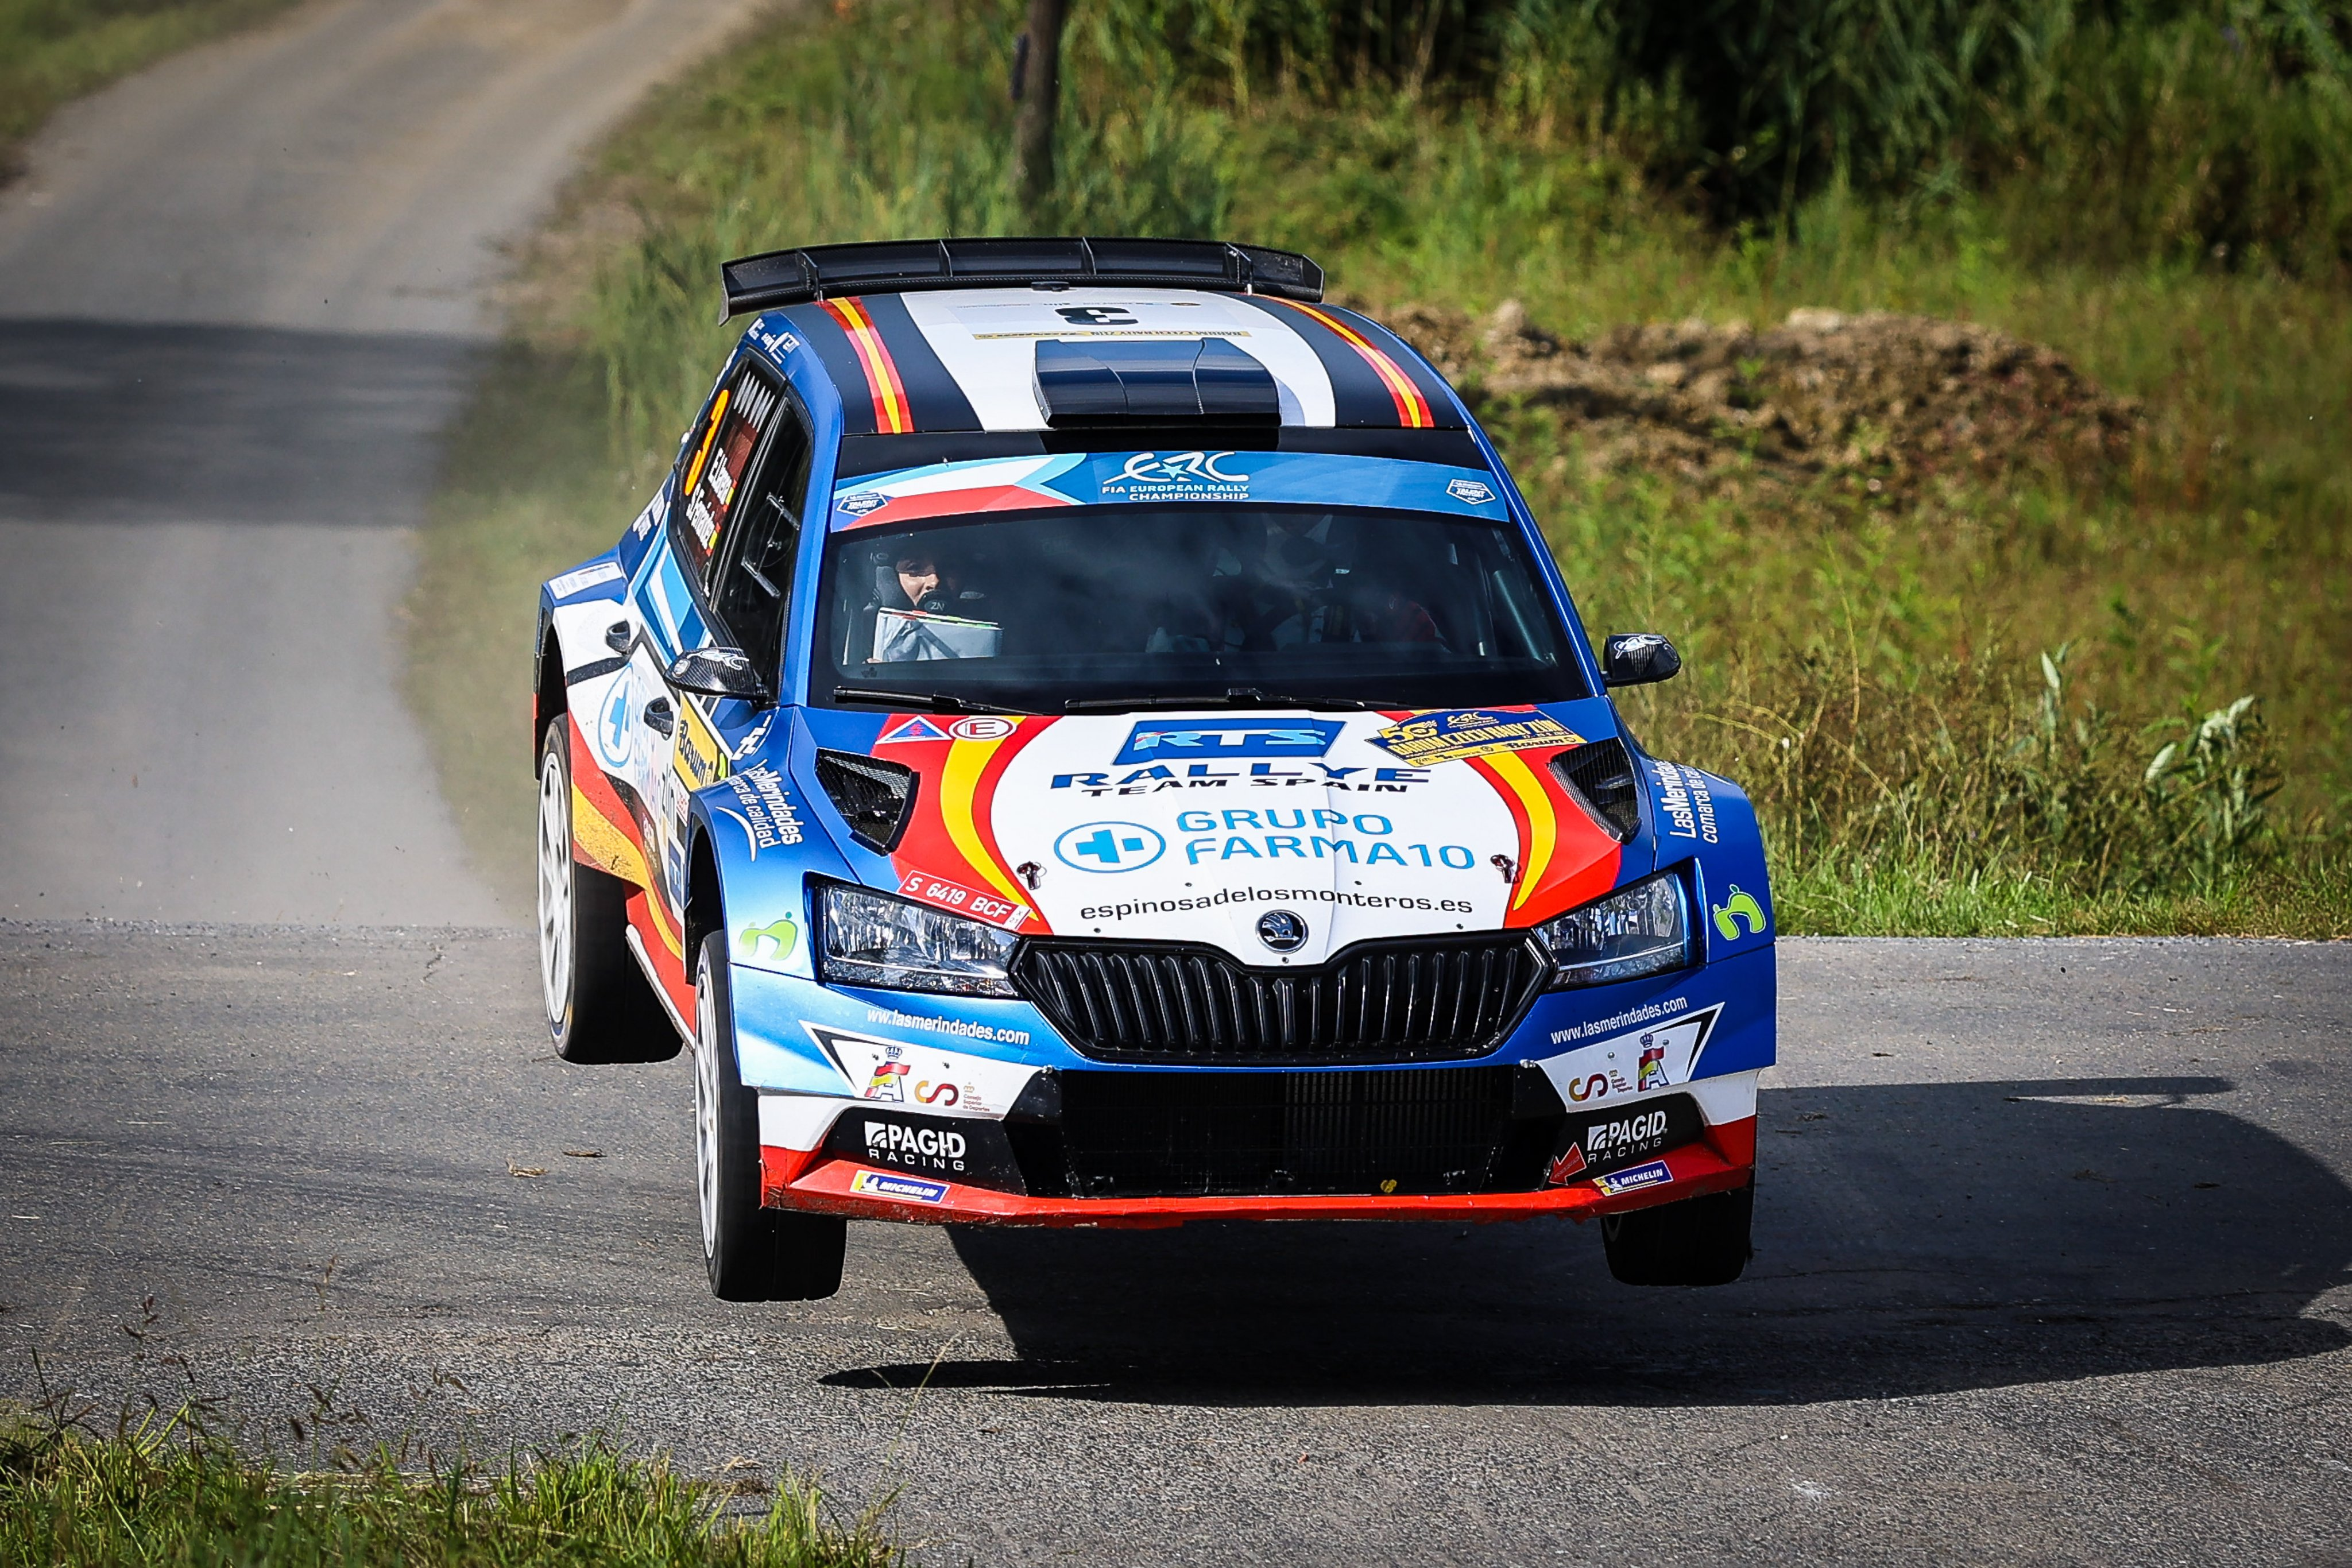 ERC: 50º Barum Czech Rally Zlin [27-29 Agosto] - Página 3 E99Kbo6WUAE2R3p?format=jpg&name=4096x4096